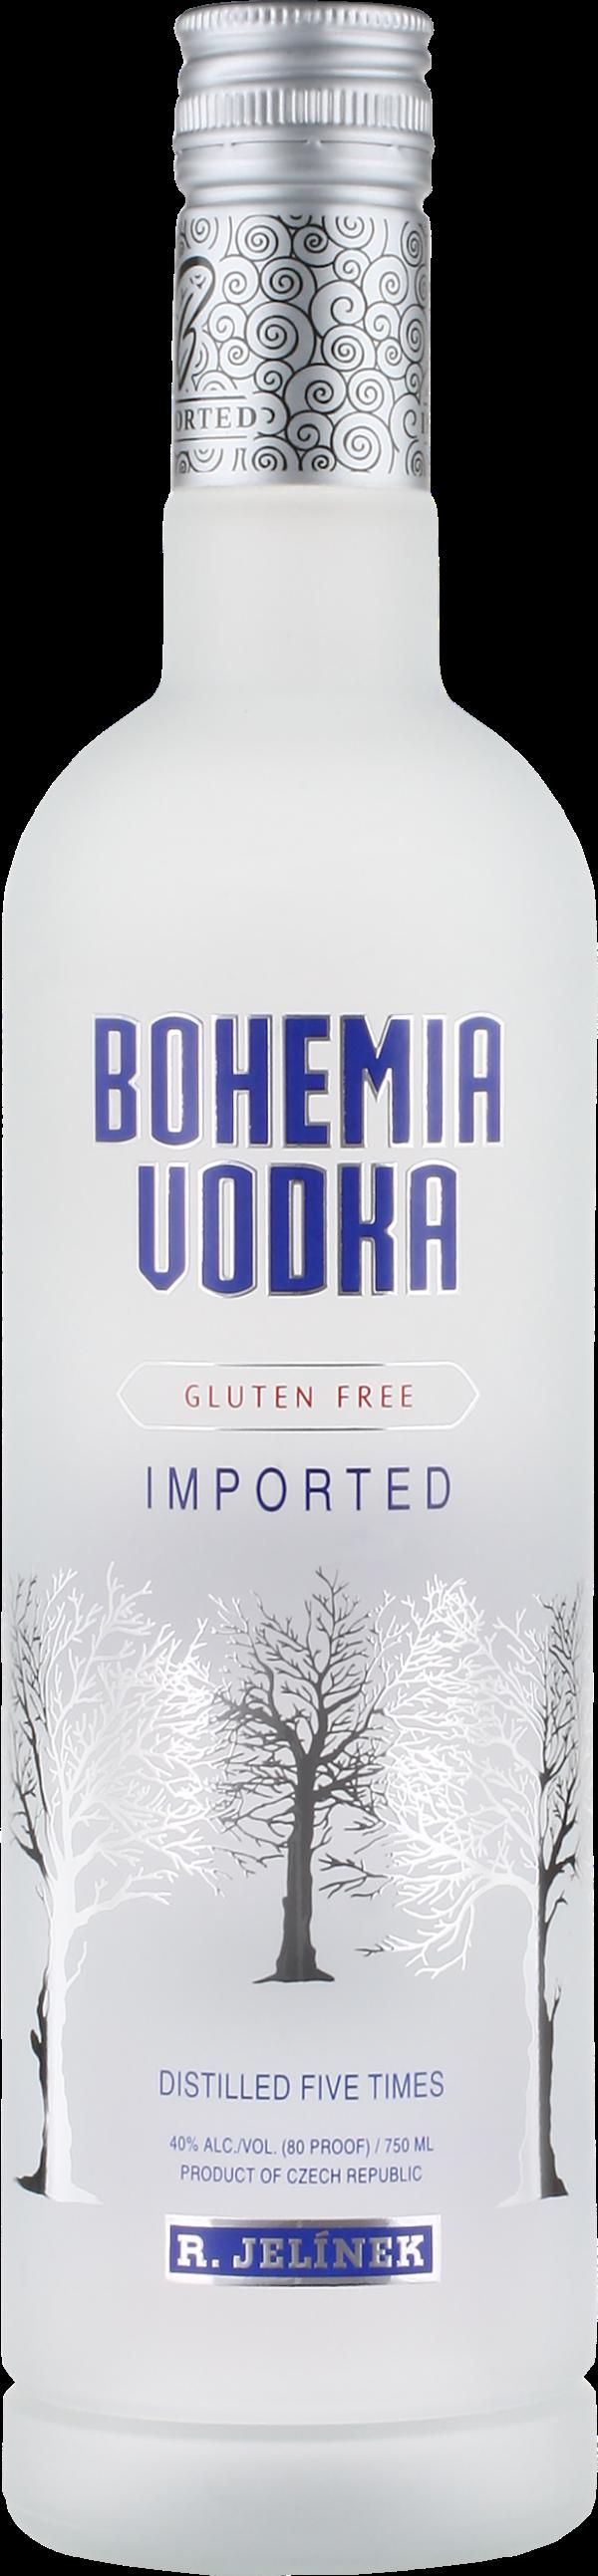 R. Jelinek Bohemia Gluten Free Potato Vodka